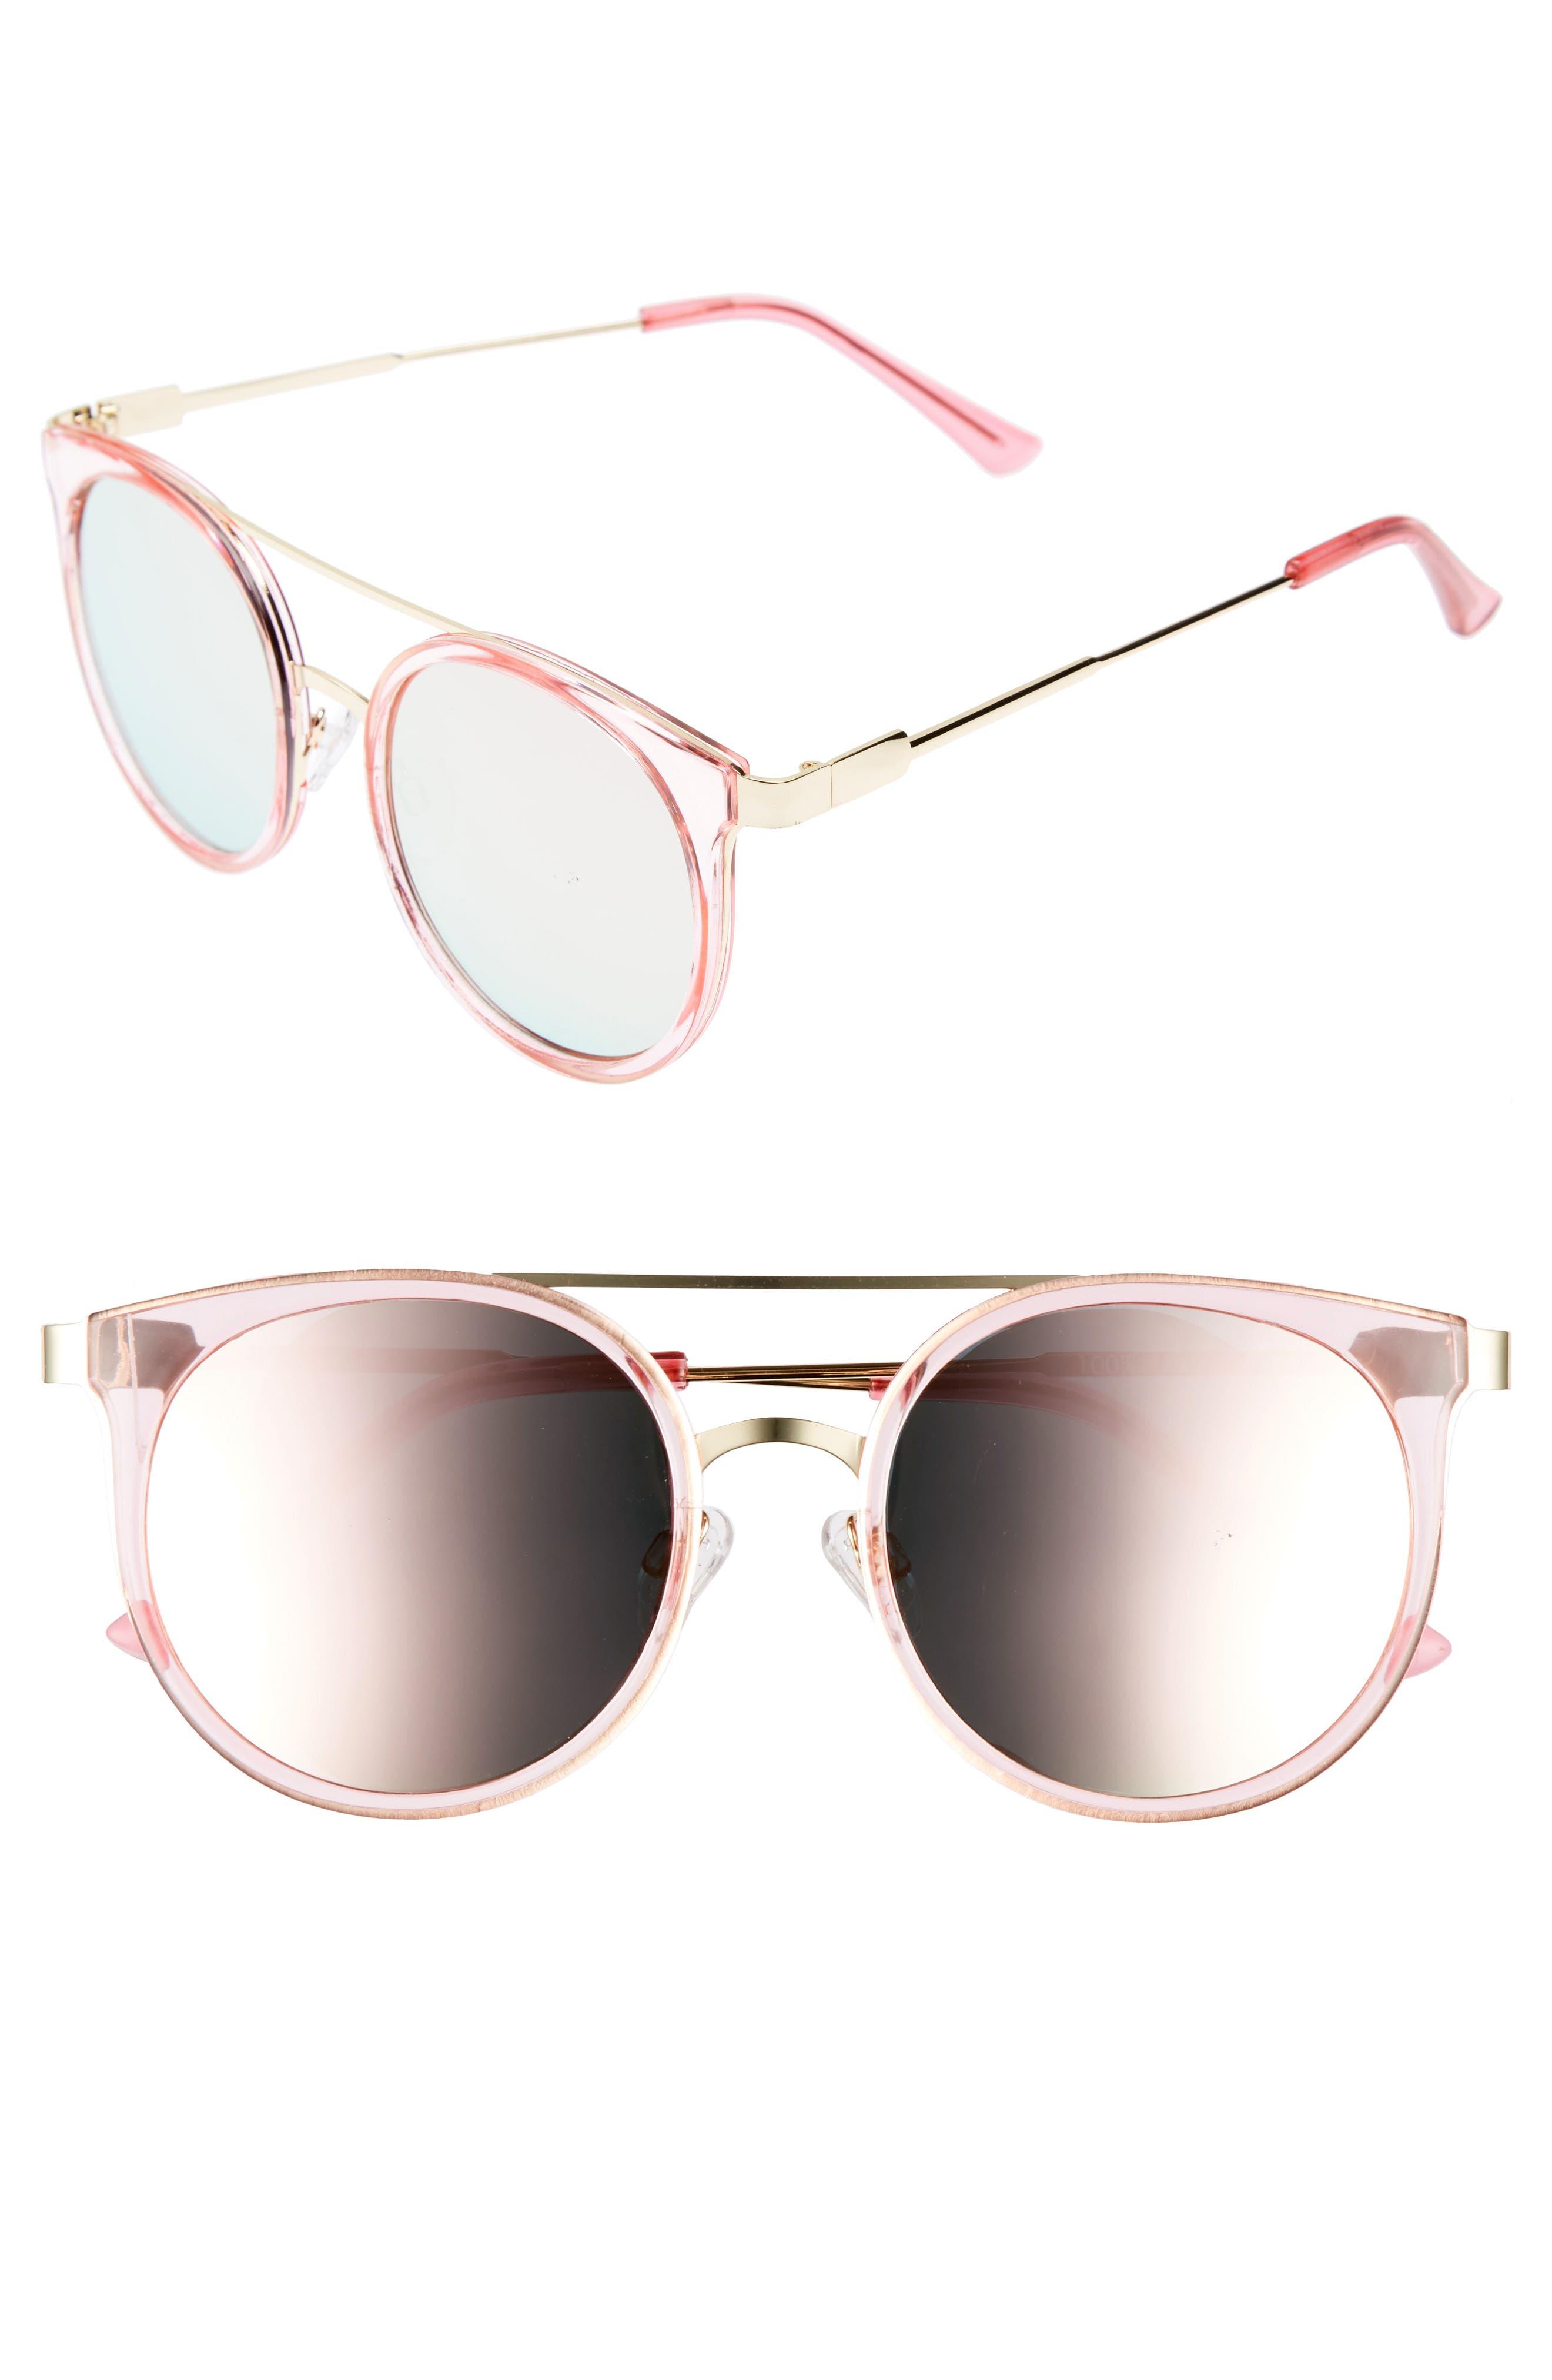 52mm Mirror Lens Round Sunglasses,                             Main thumbnail 1, color,                             710